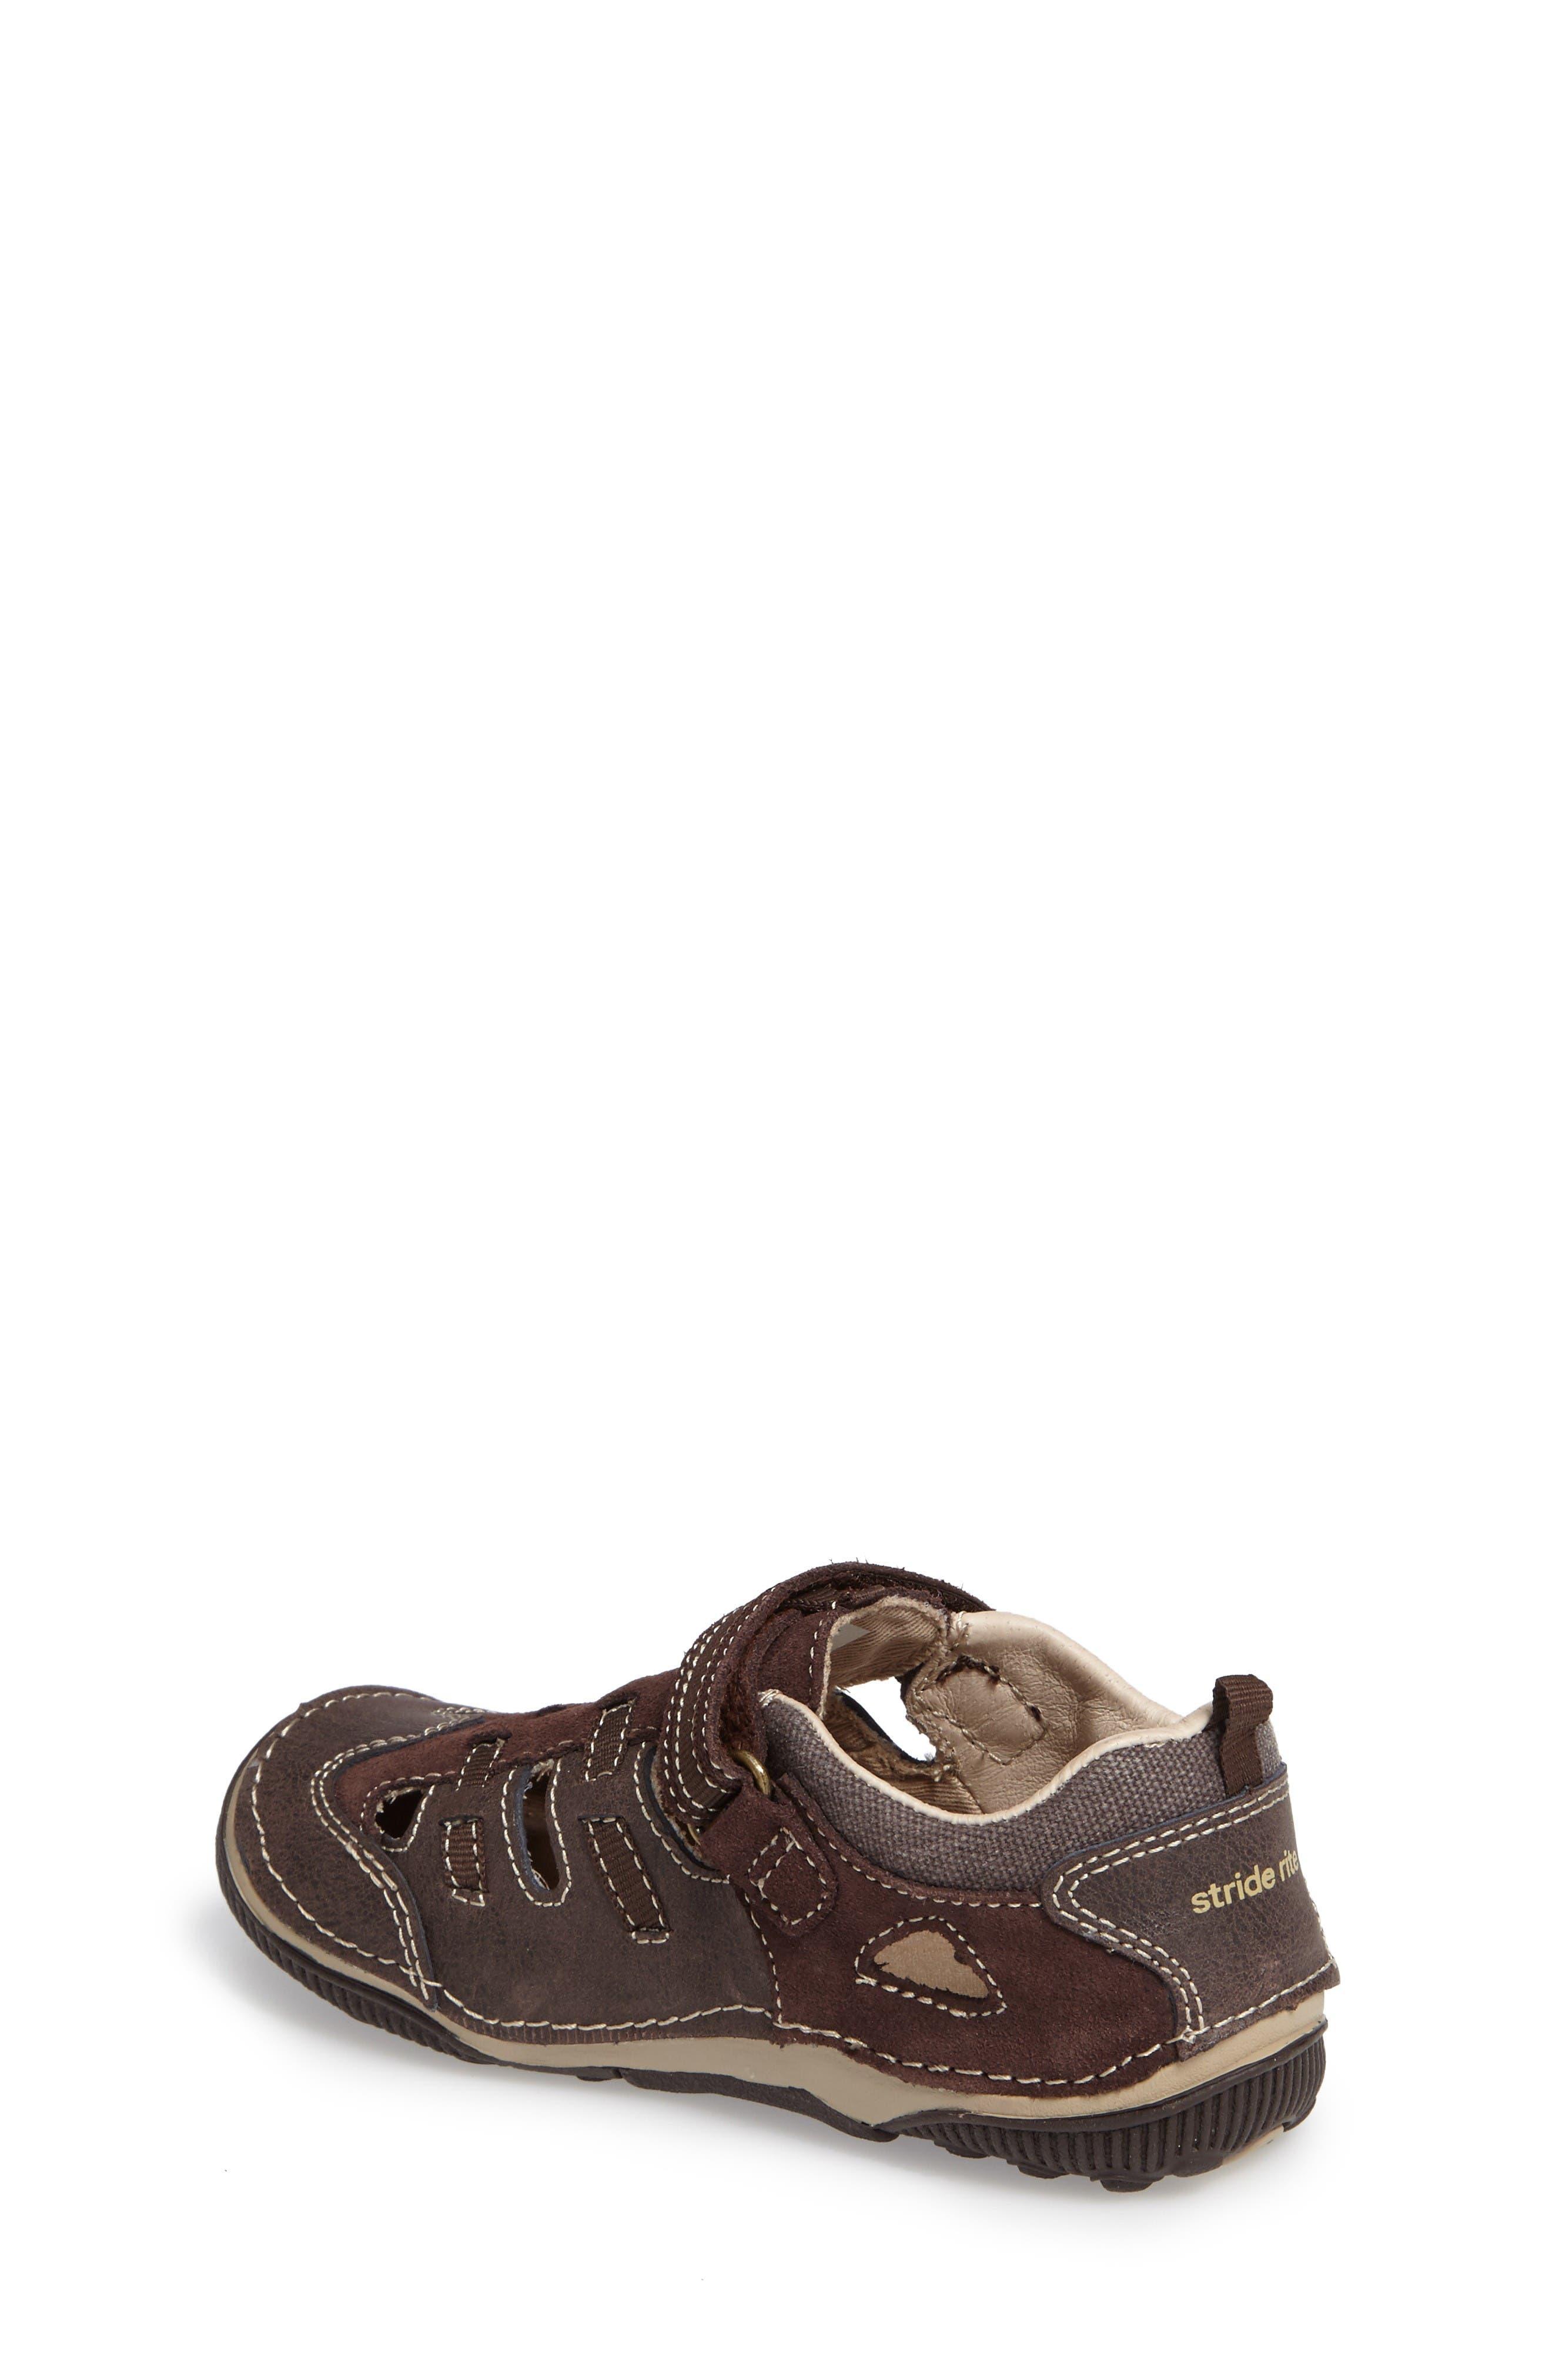 Reggie Cutout Sneaker,                             Alternate thumbnail 2, color,                             Brown Leather